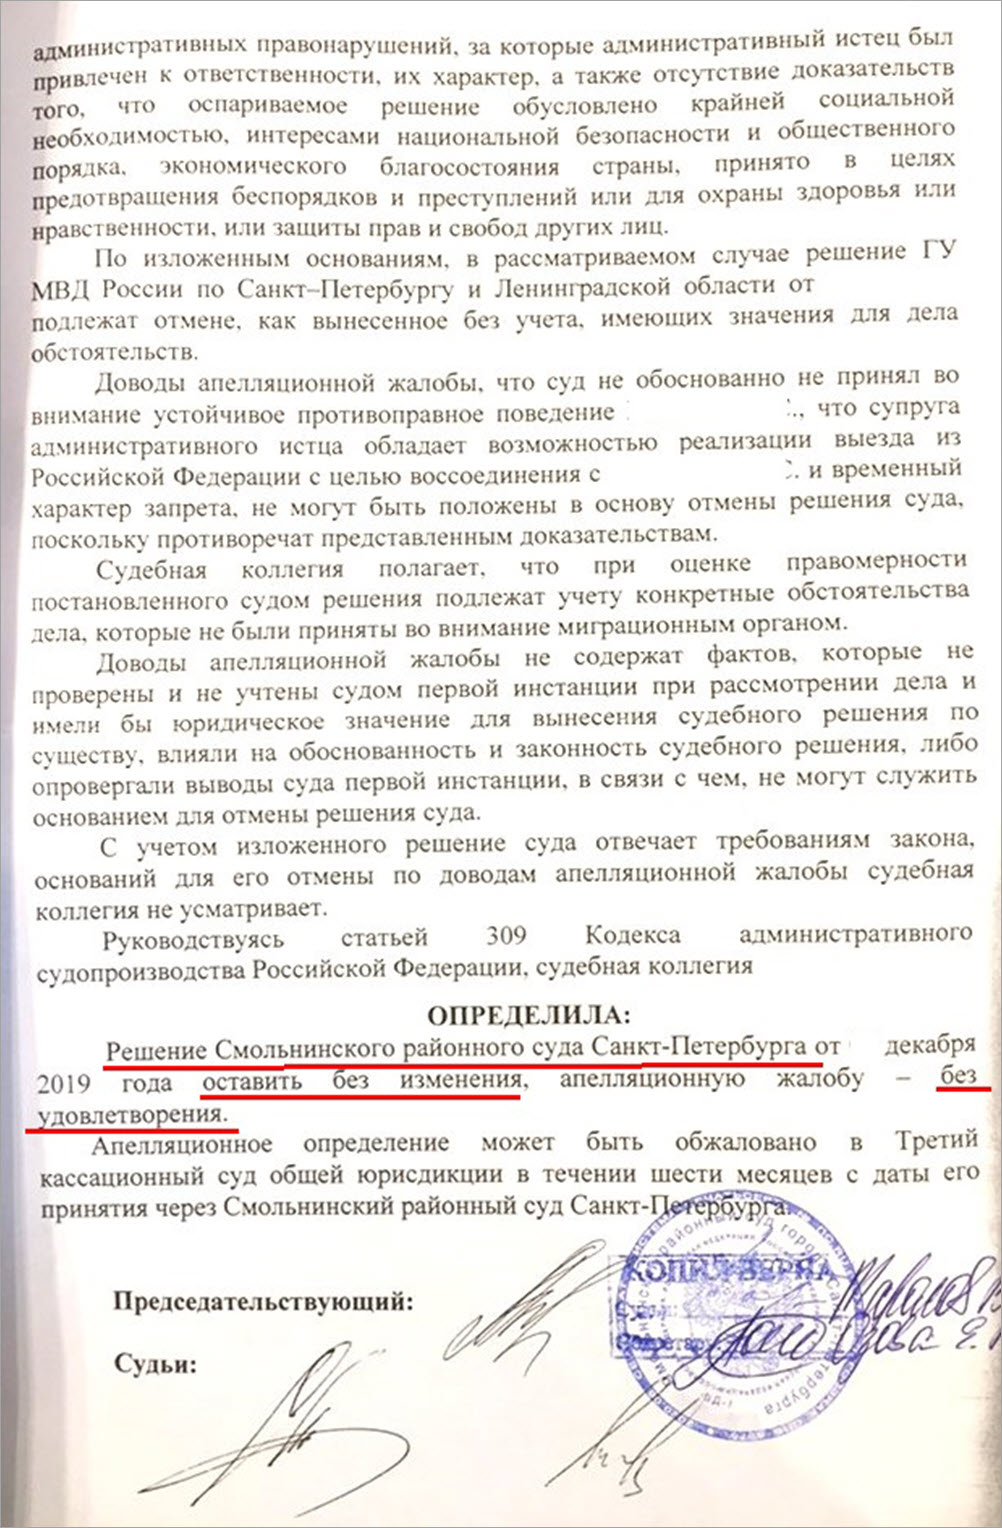 Апелляционная жалоба УМВД РФ по СПБ не удовлетворена